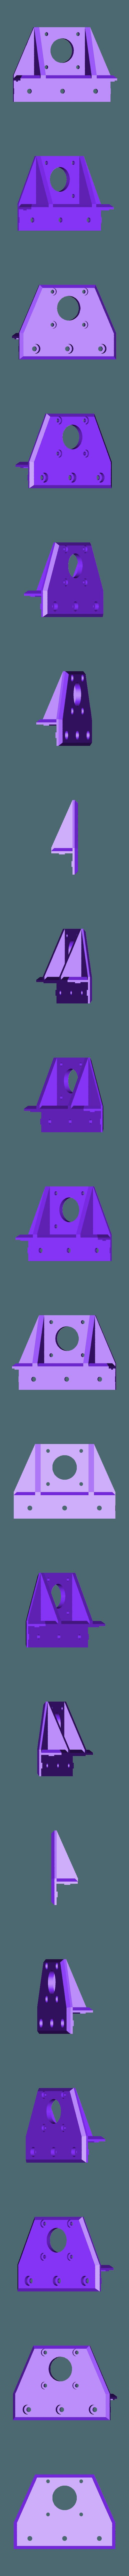 2020_NEMA17_VERT_B.stl Download free STL file 2020 Profile Aluminum 3D Printable Erector Set • 3D printer model, adamjvr